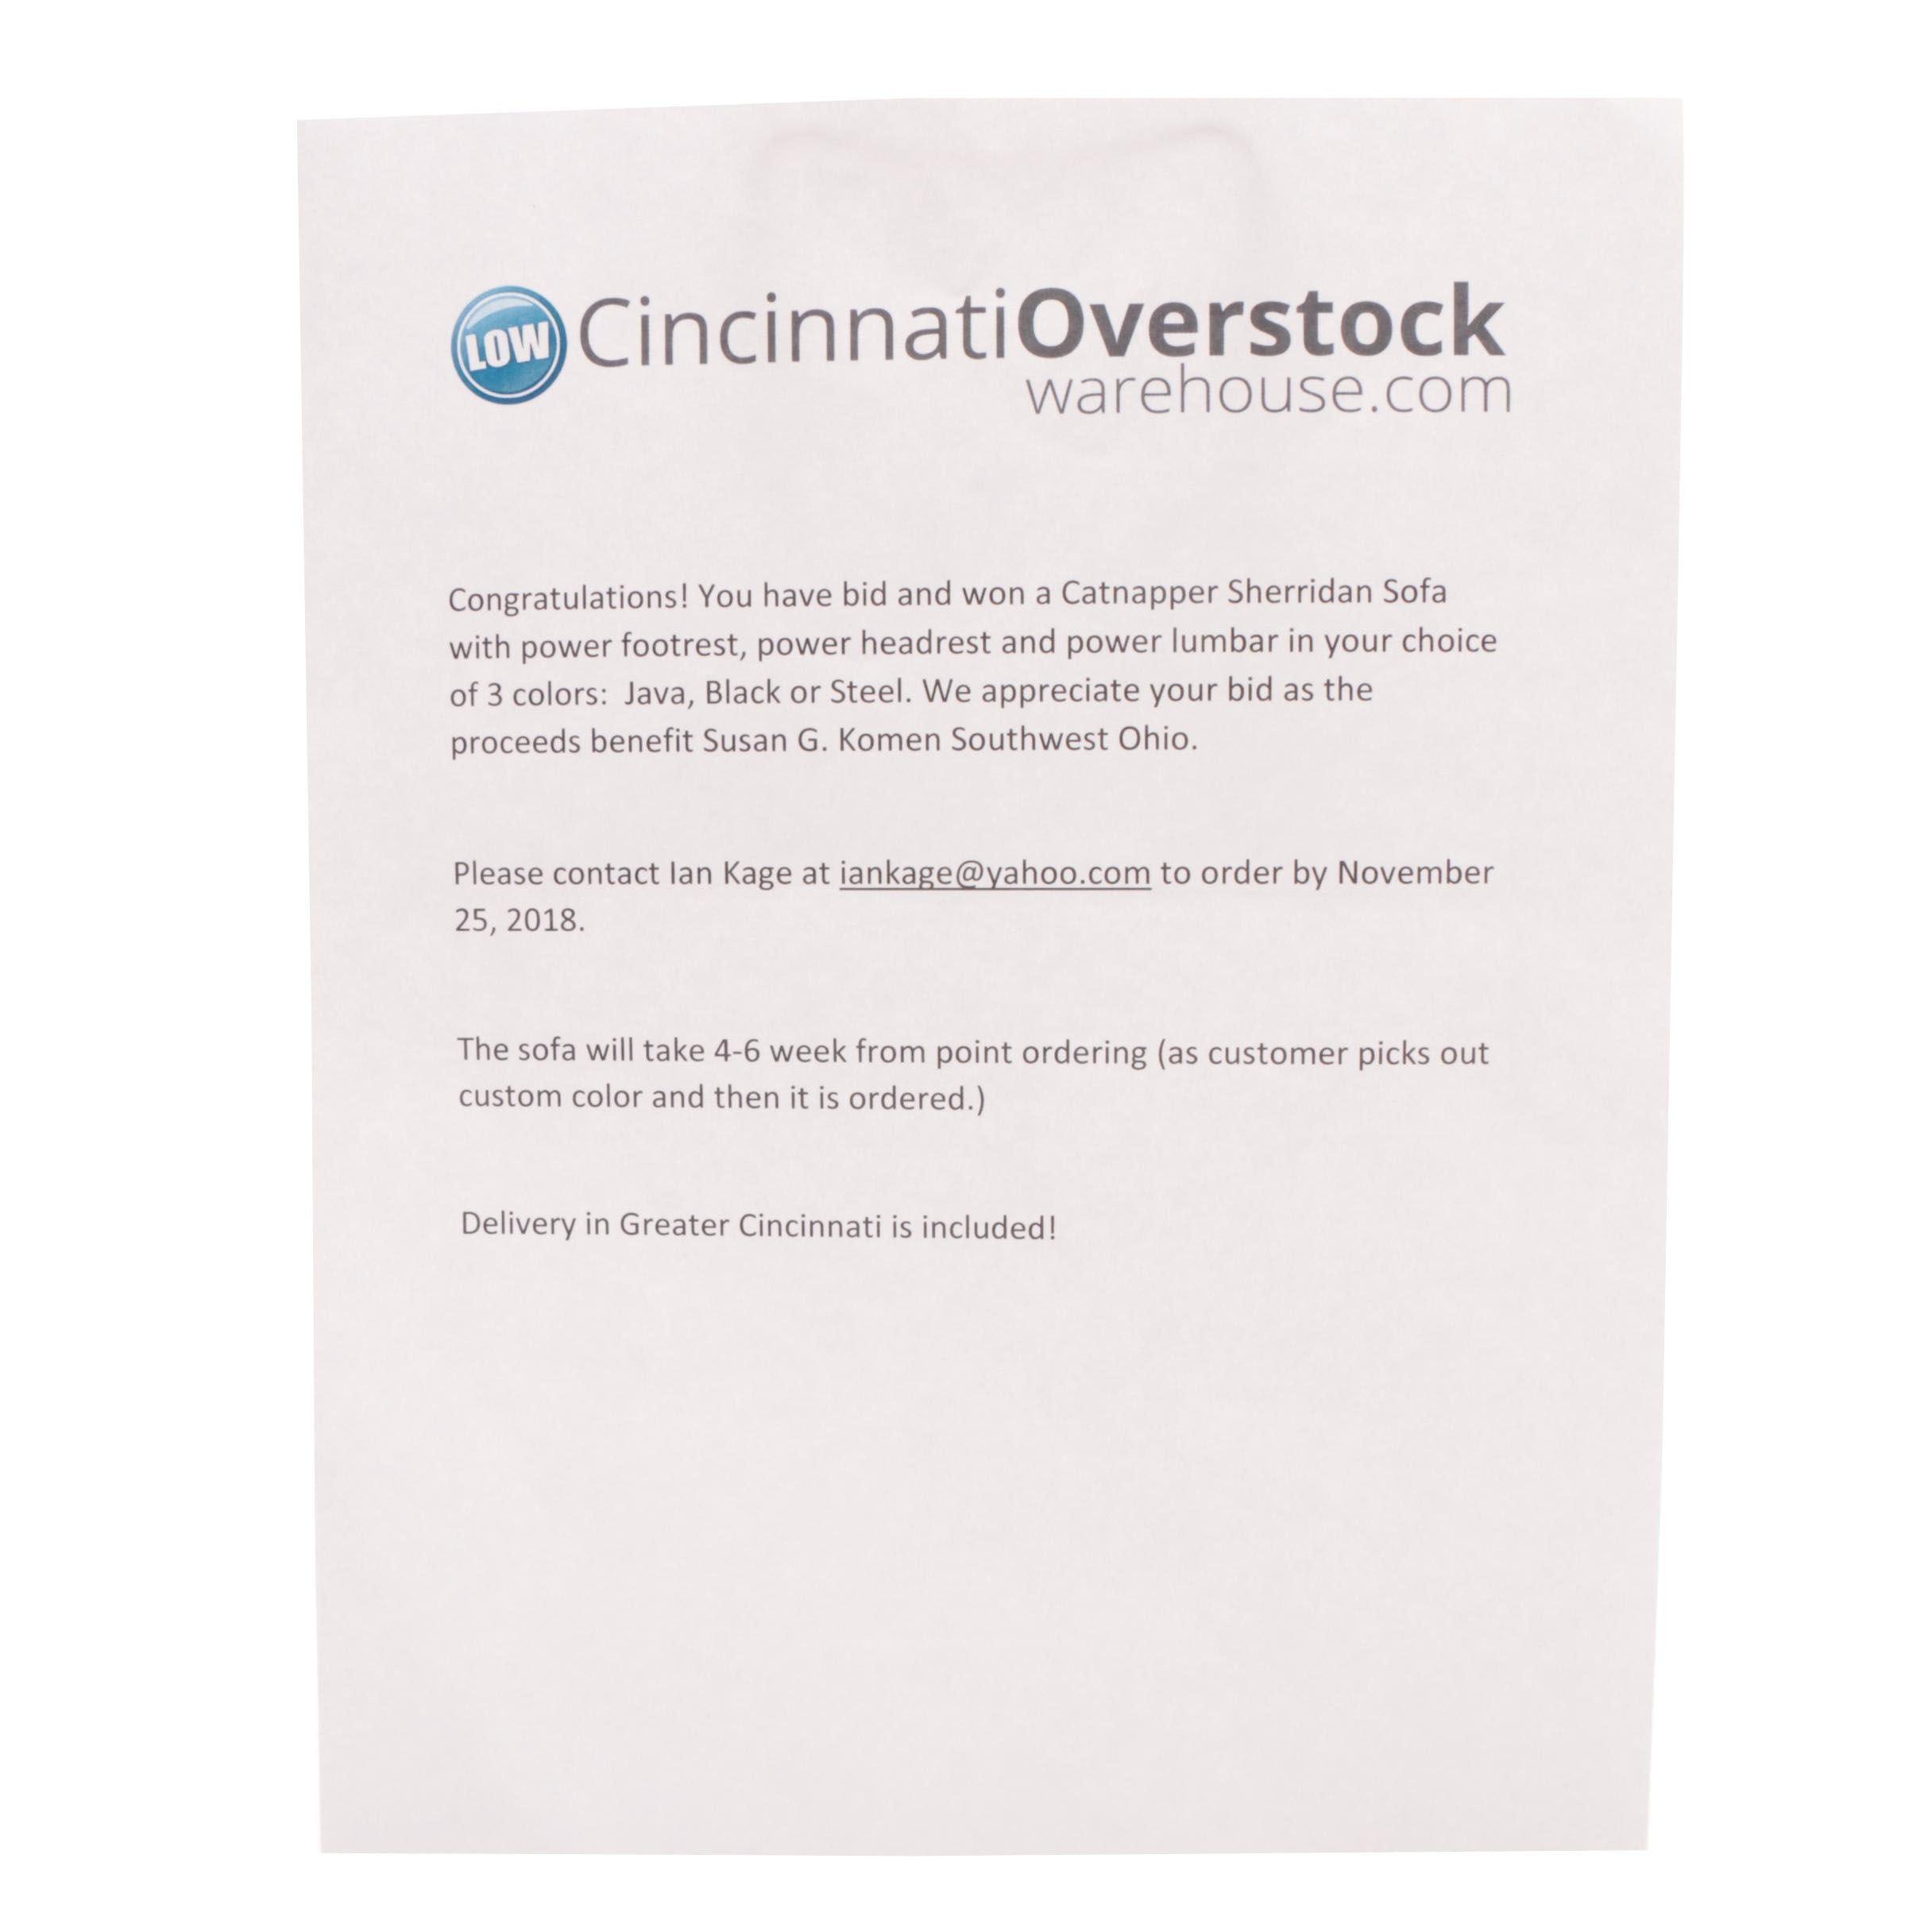 Catnapper Sherridan Sofa from Cincinnati Overstock - Certificate